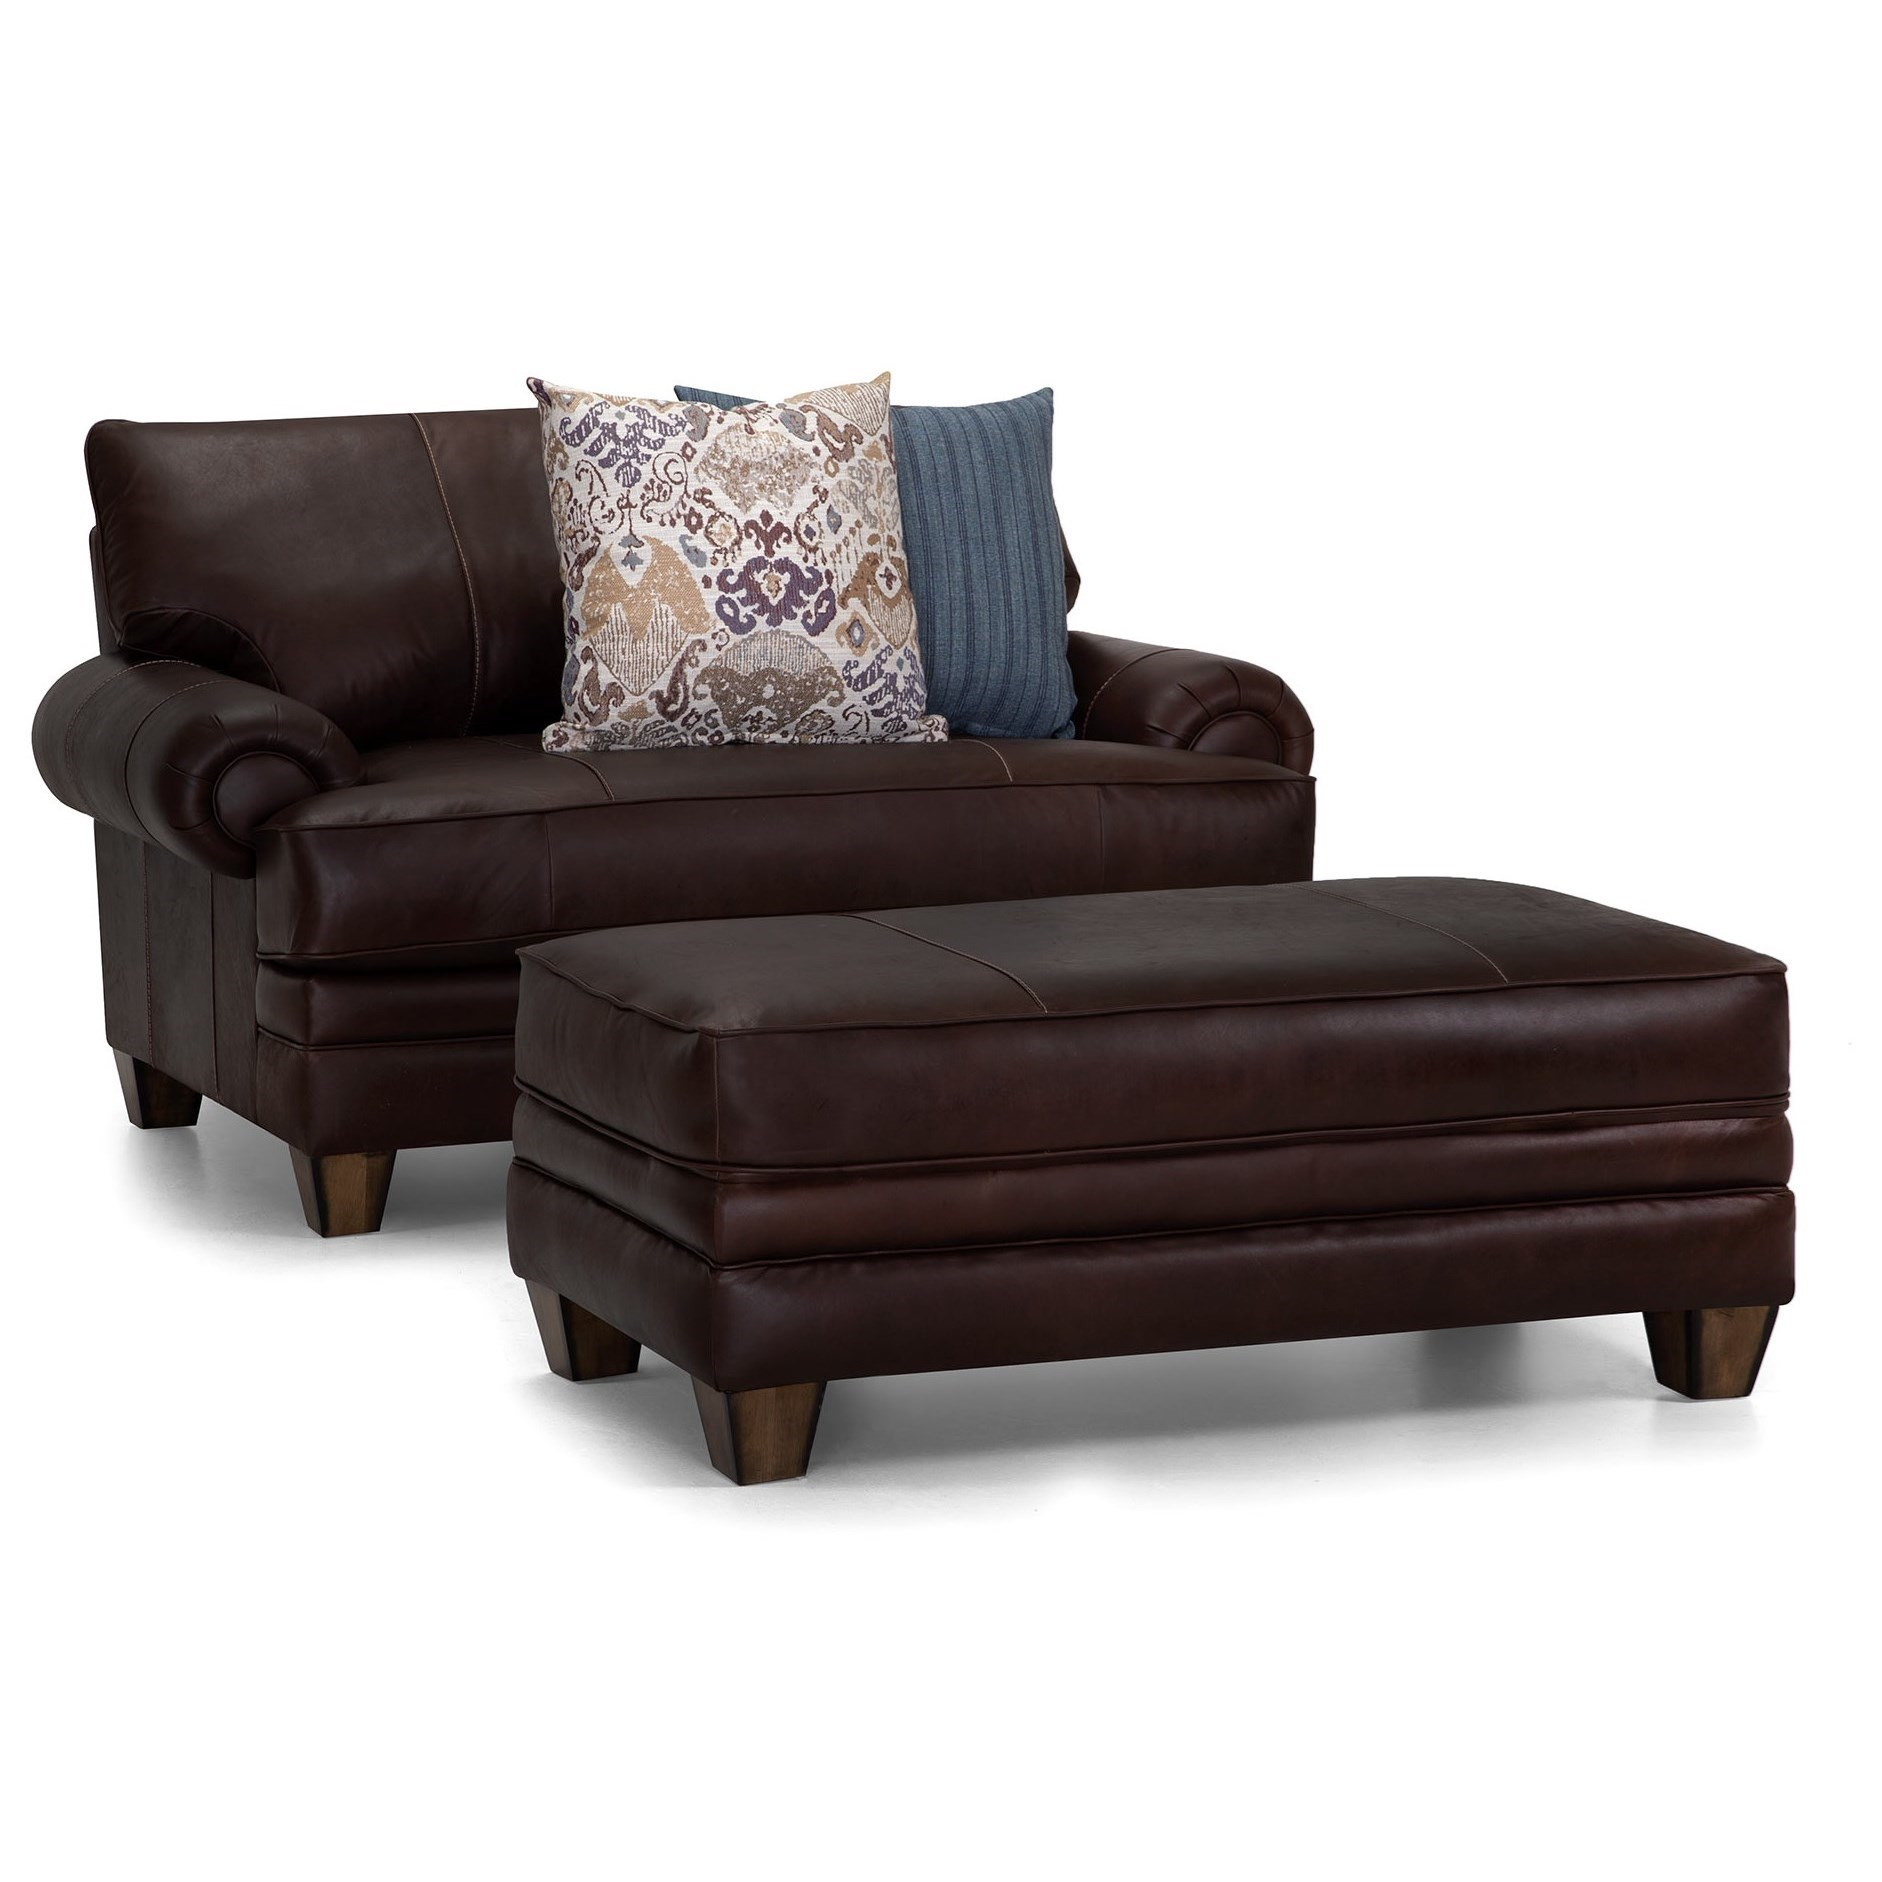 story lee furniture